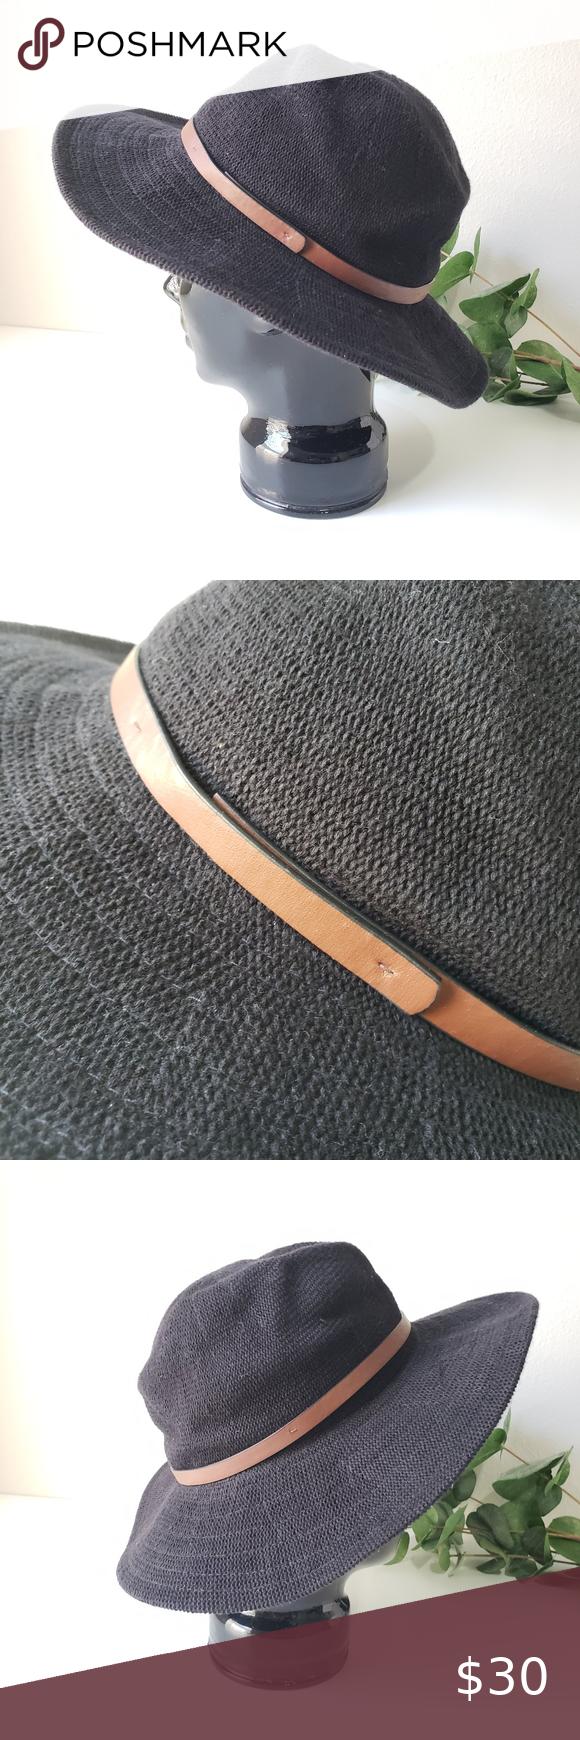 Anthropologie Ecote Soft Floppy Panama Sun Hat Women Accessories Hats Sun Hats Anthropologie Accessories